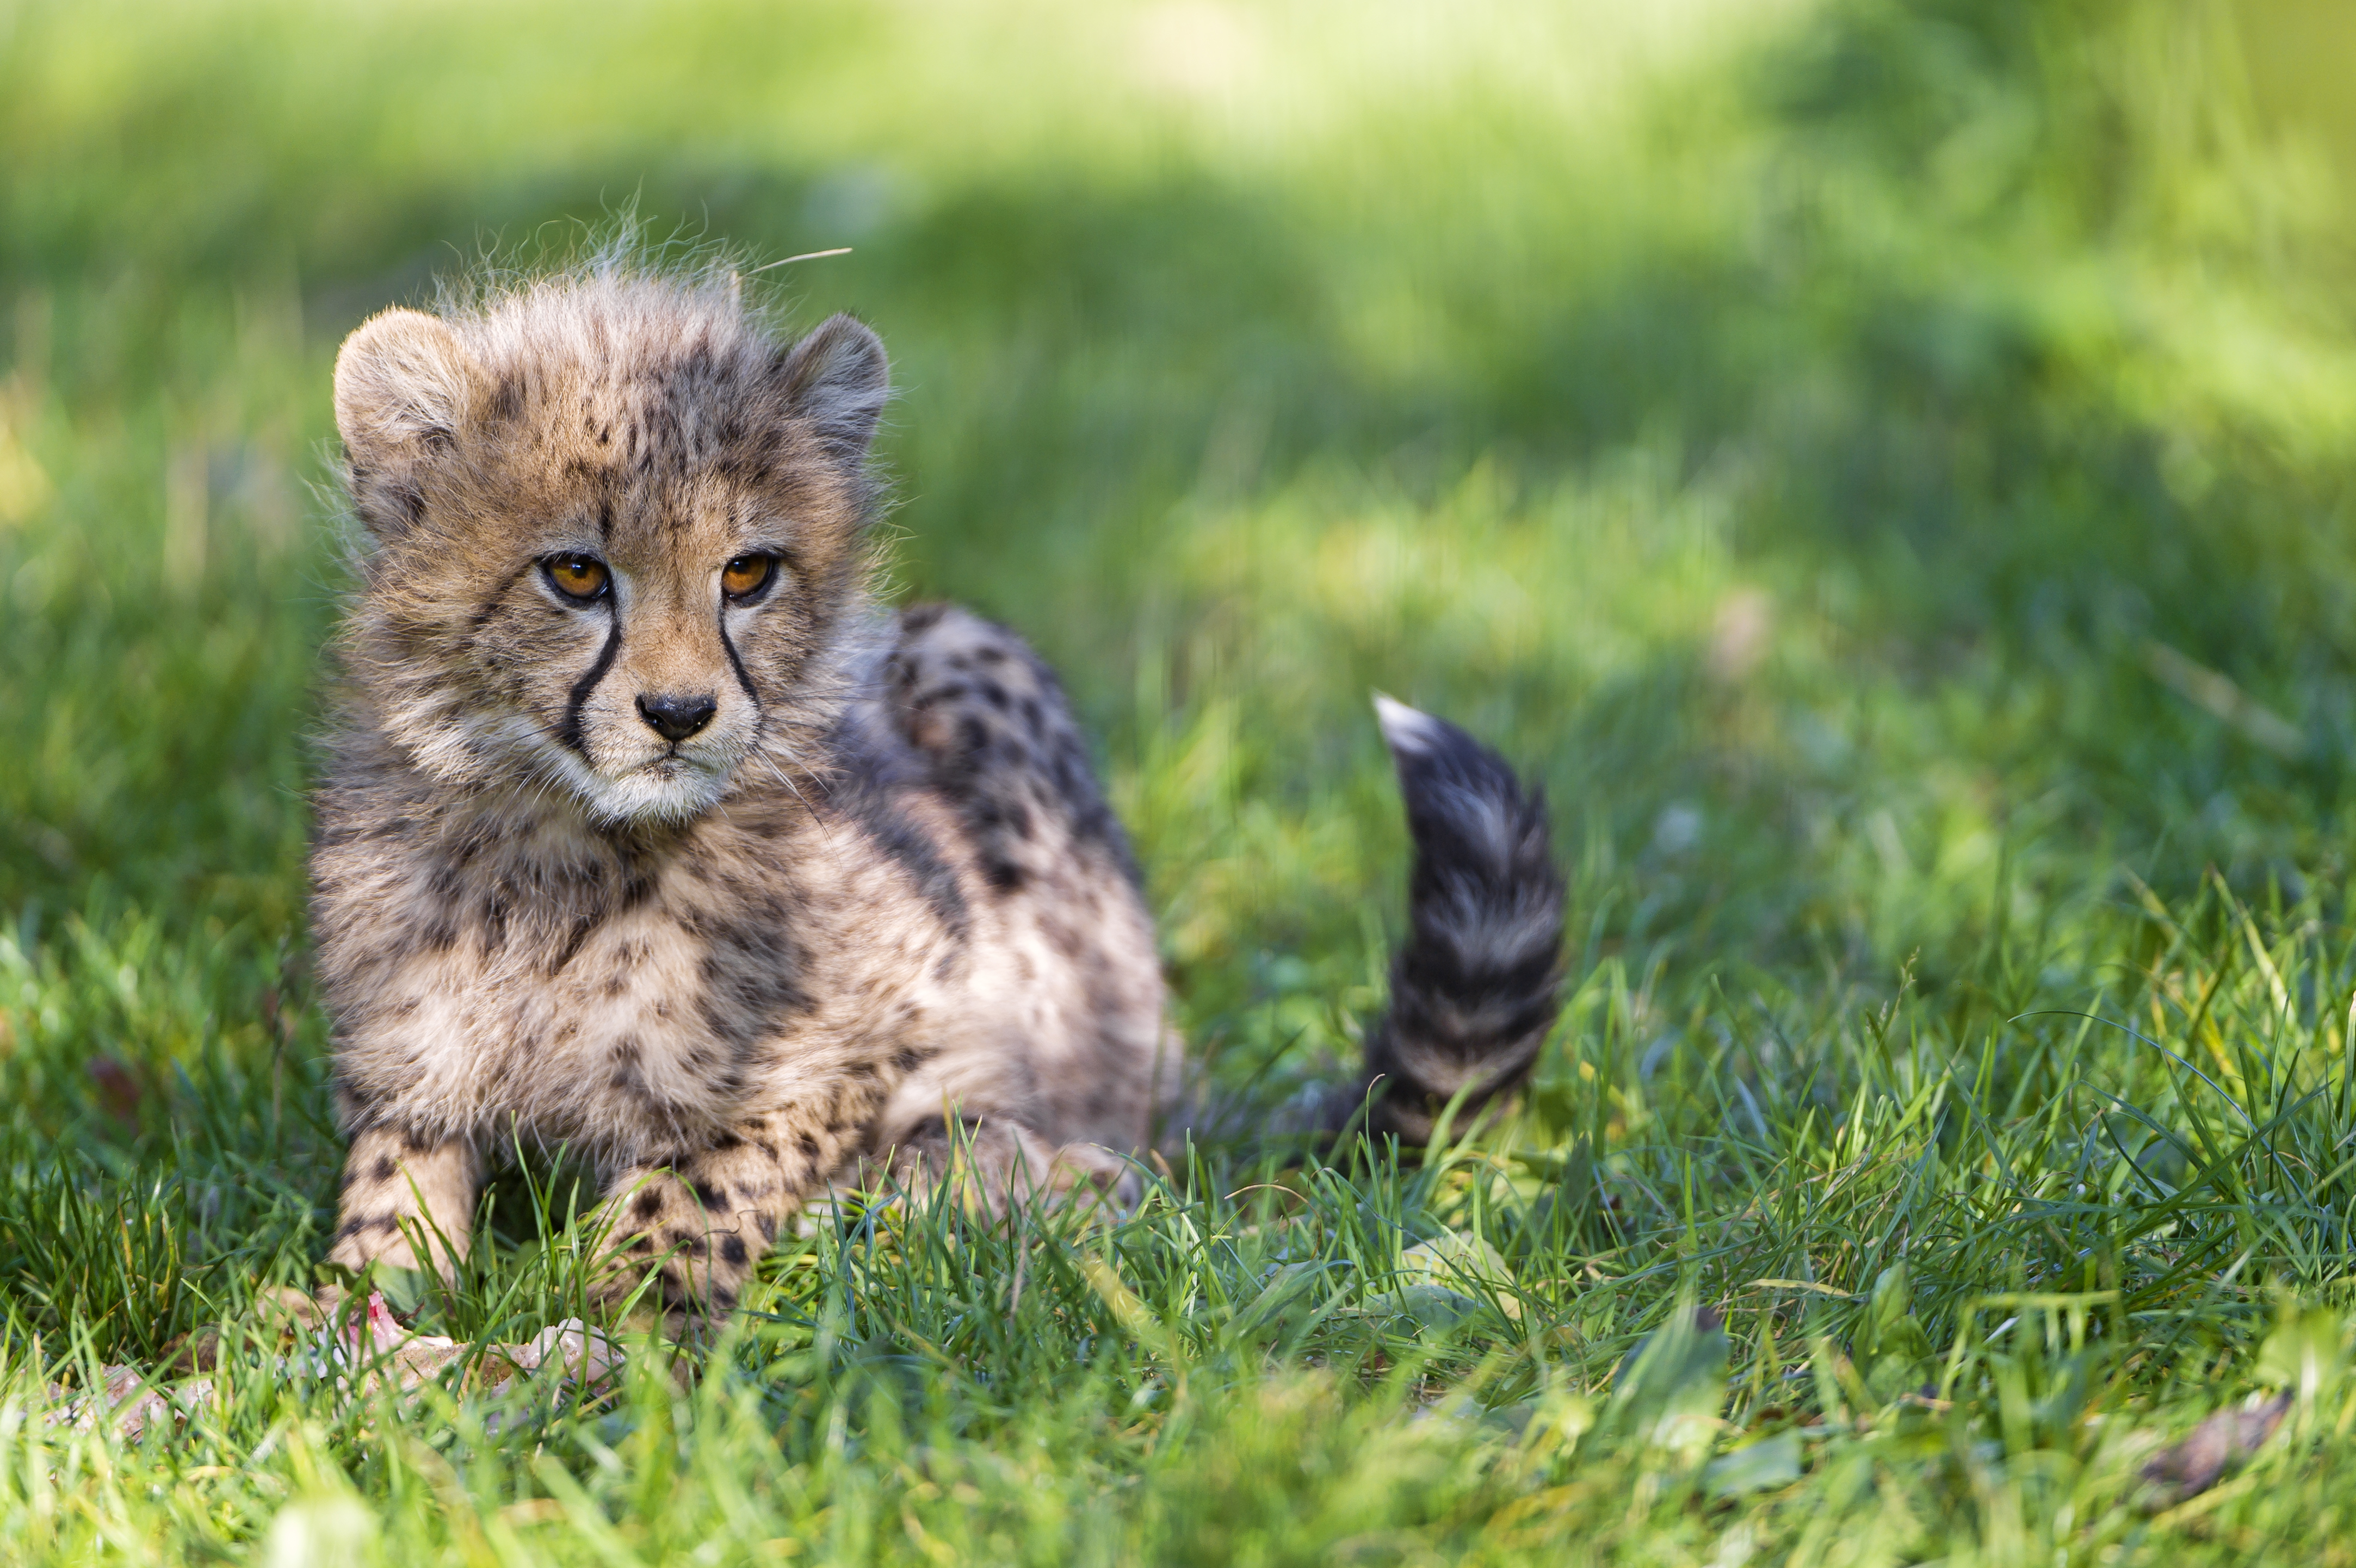 Baby Cheetah 4k Ultra HD Wallpaper | Background Image ...